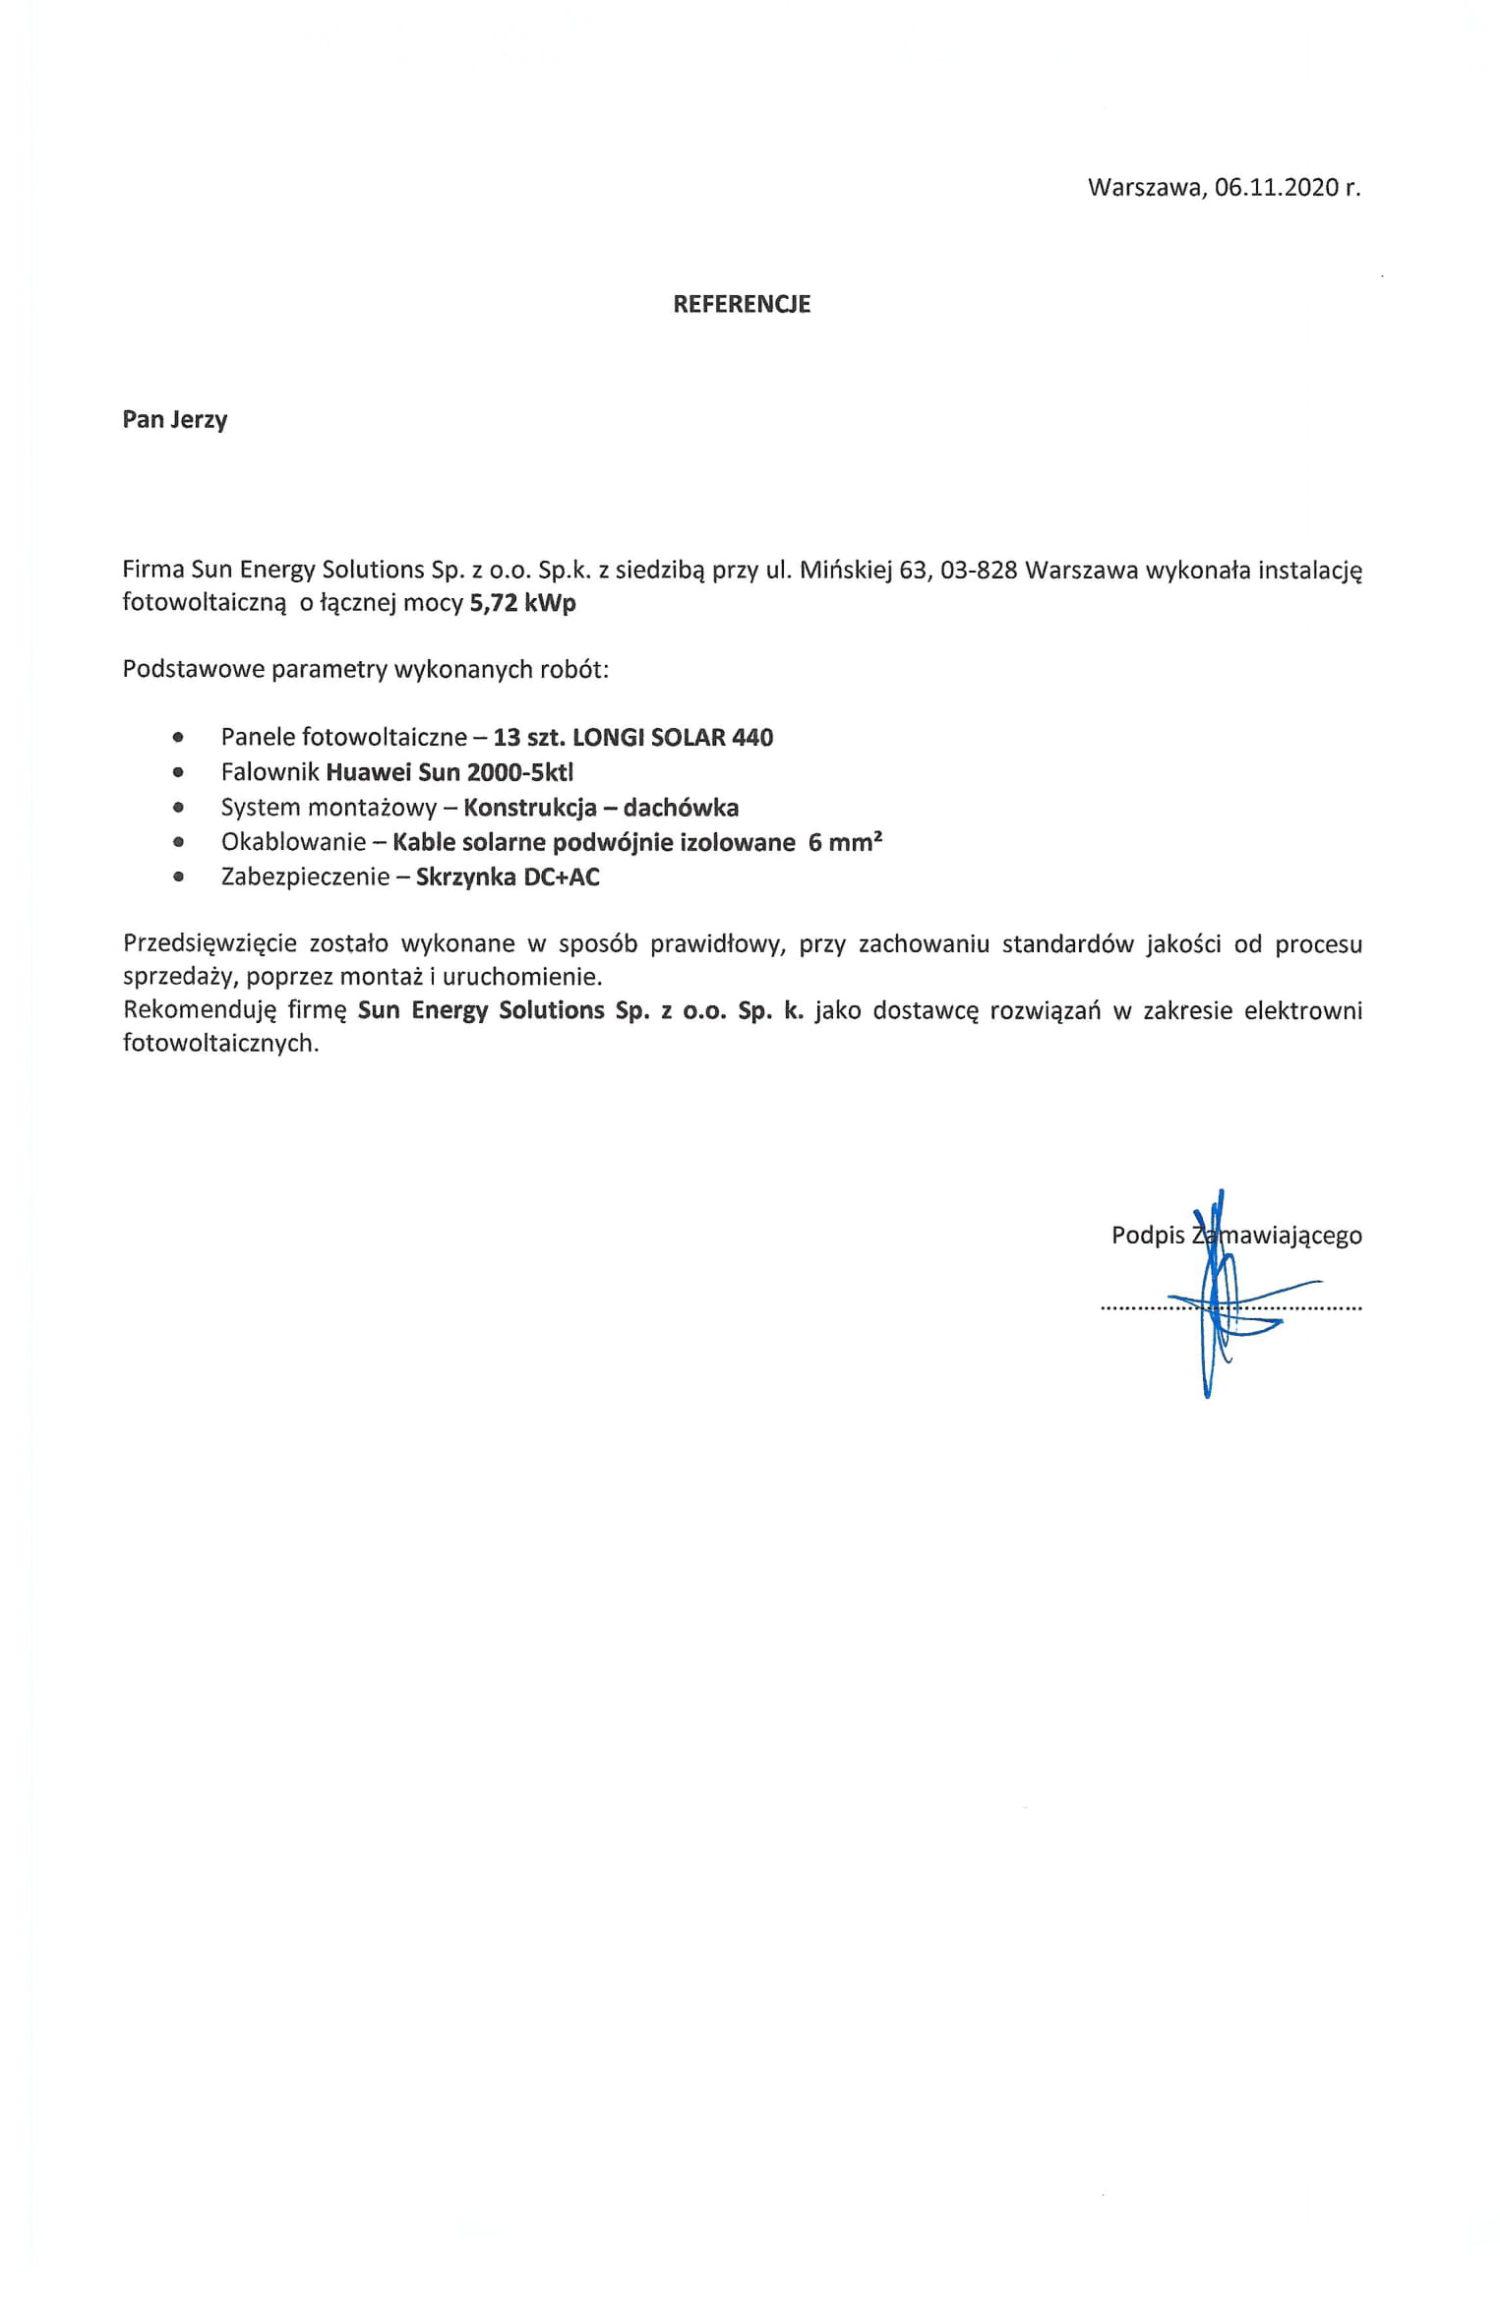 https://www.sunes.pl/wp-content/uploads/2020/11/Referencja-Listopad-2020-2-1500x2300.jpg